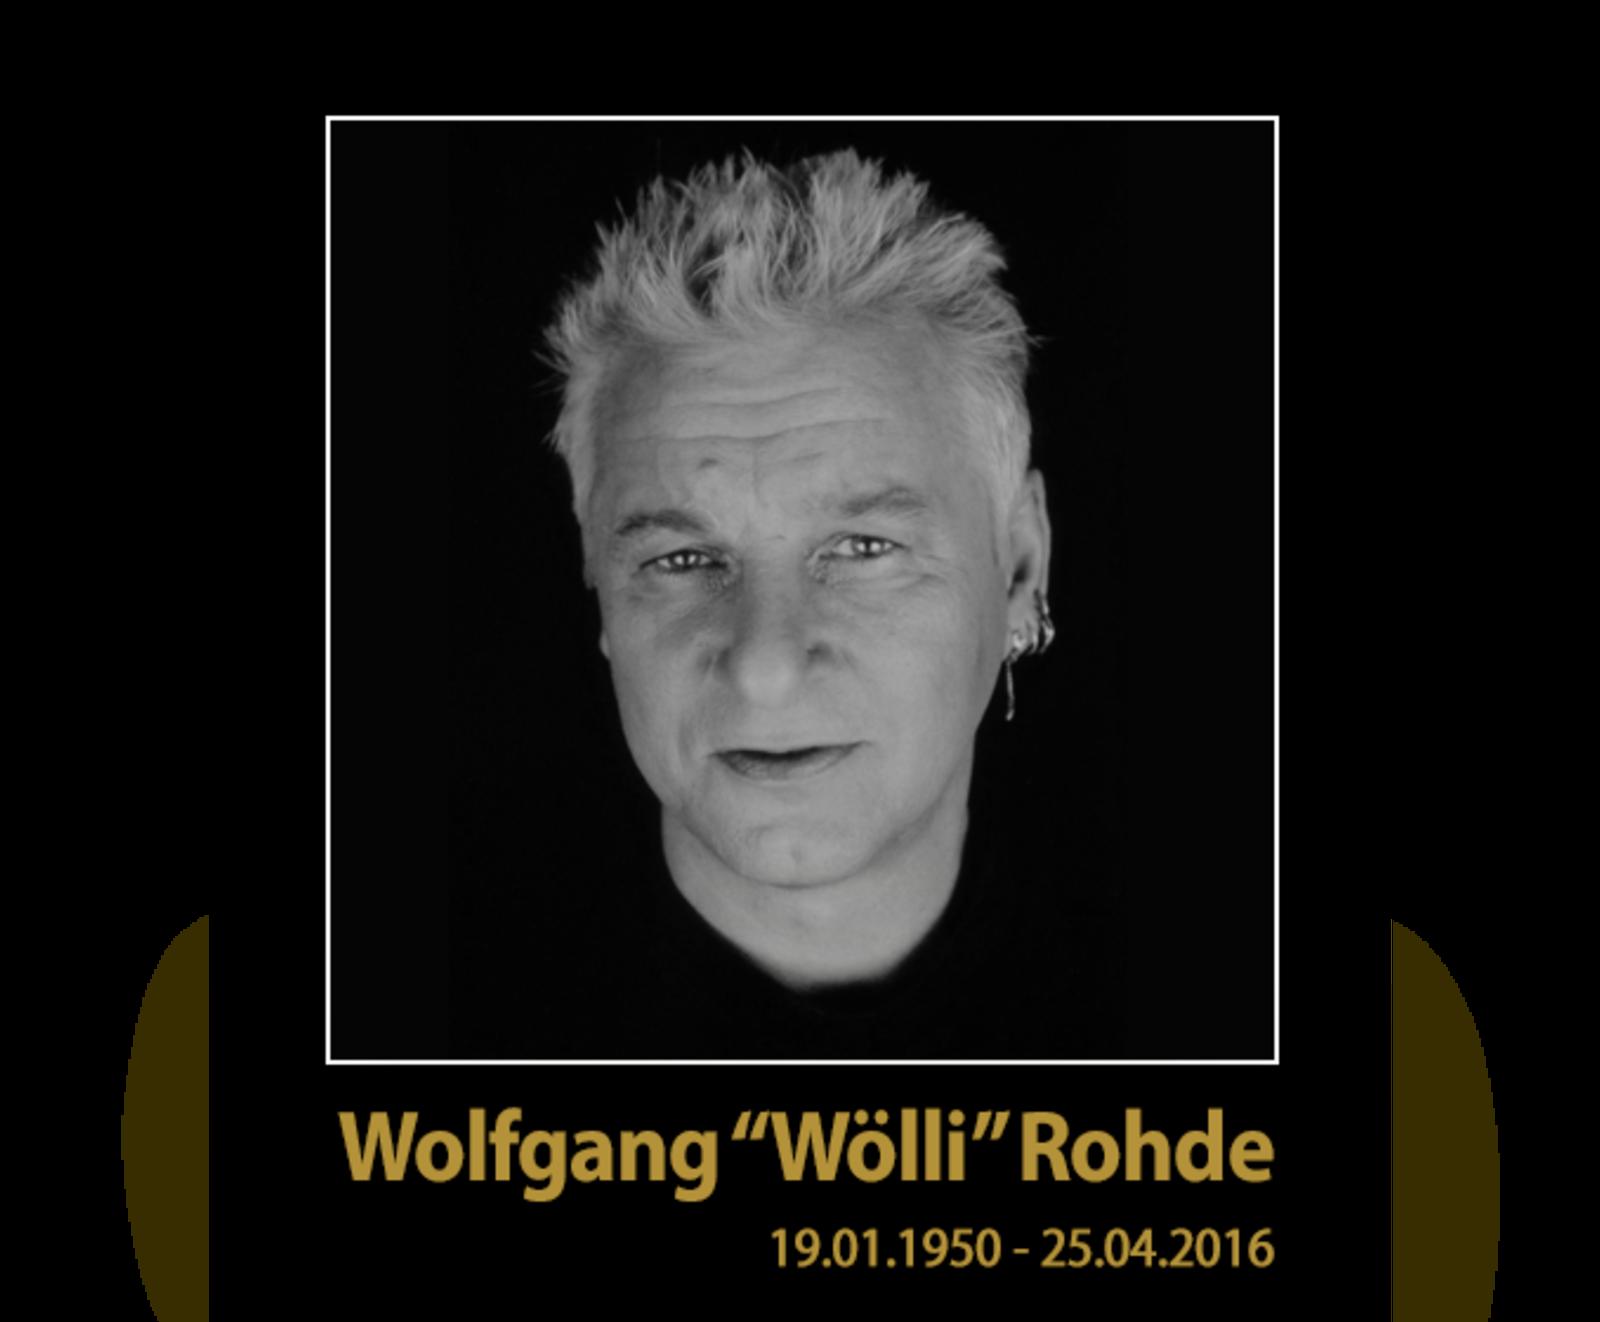 Wölli Rohde